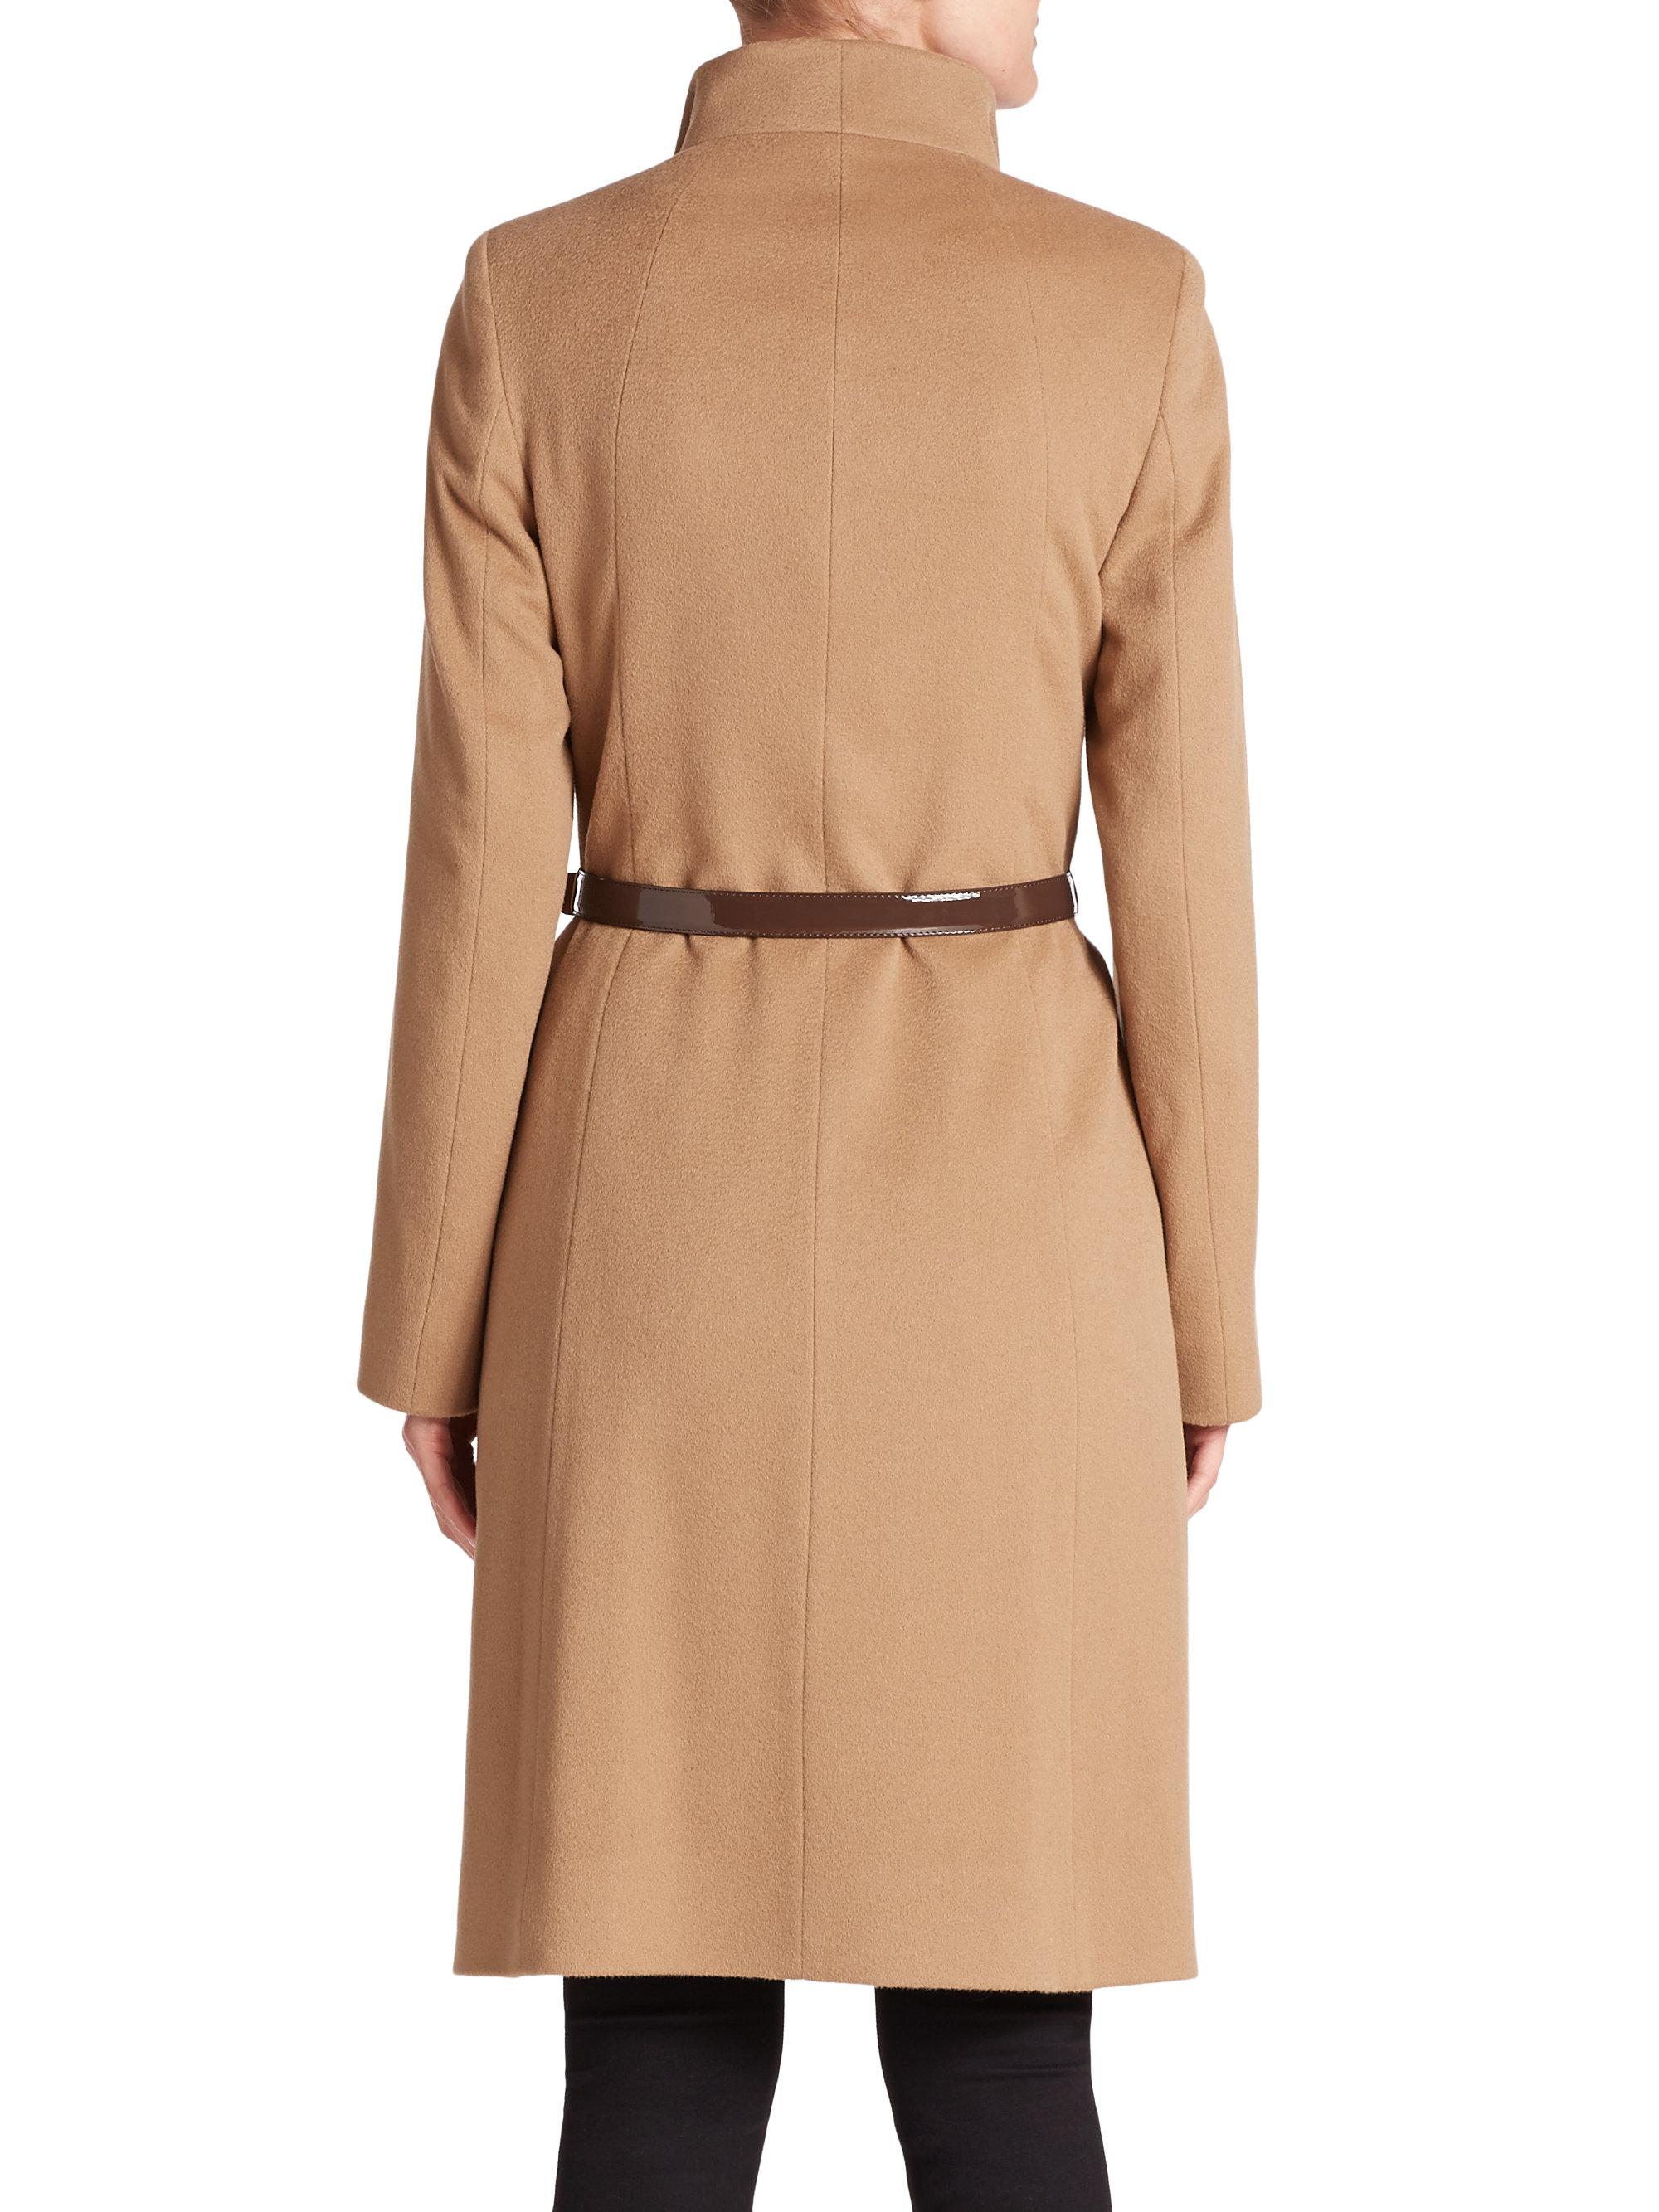 Cinzia rocca Belted Cashmere Coat in Natural   Lyst